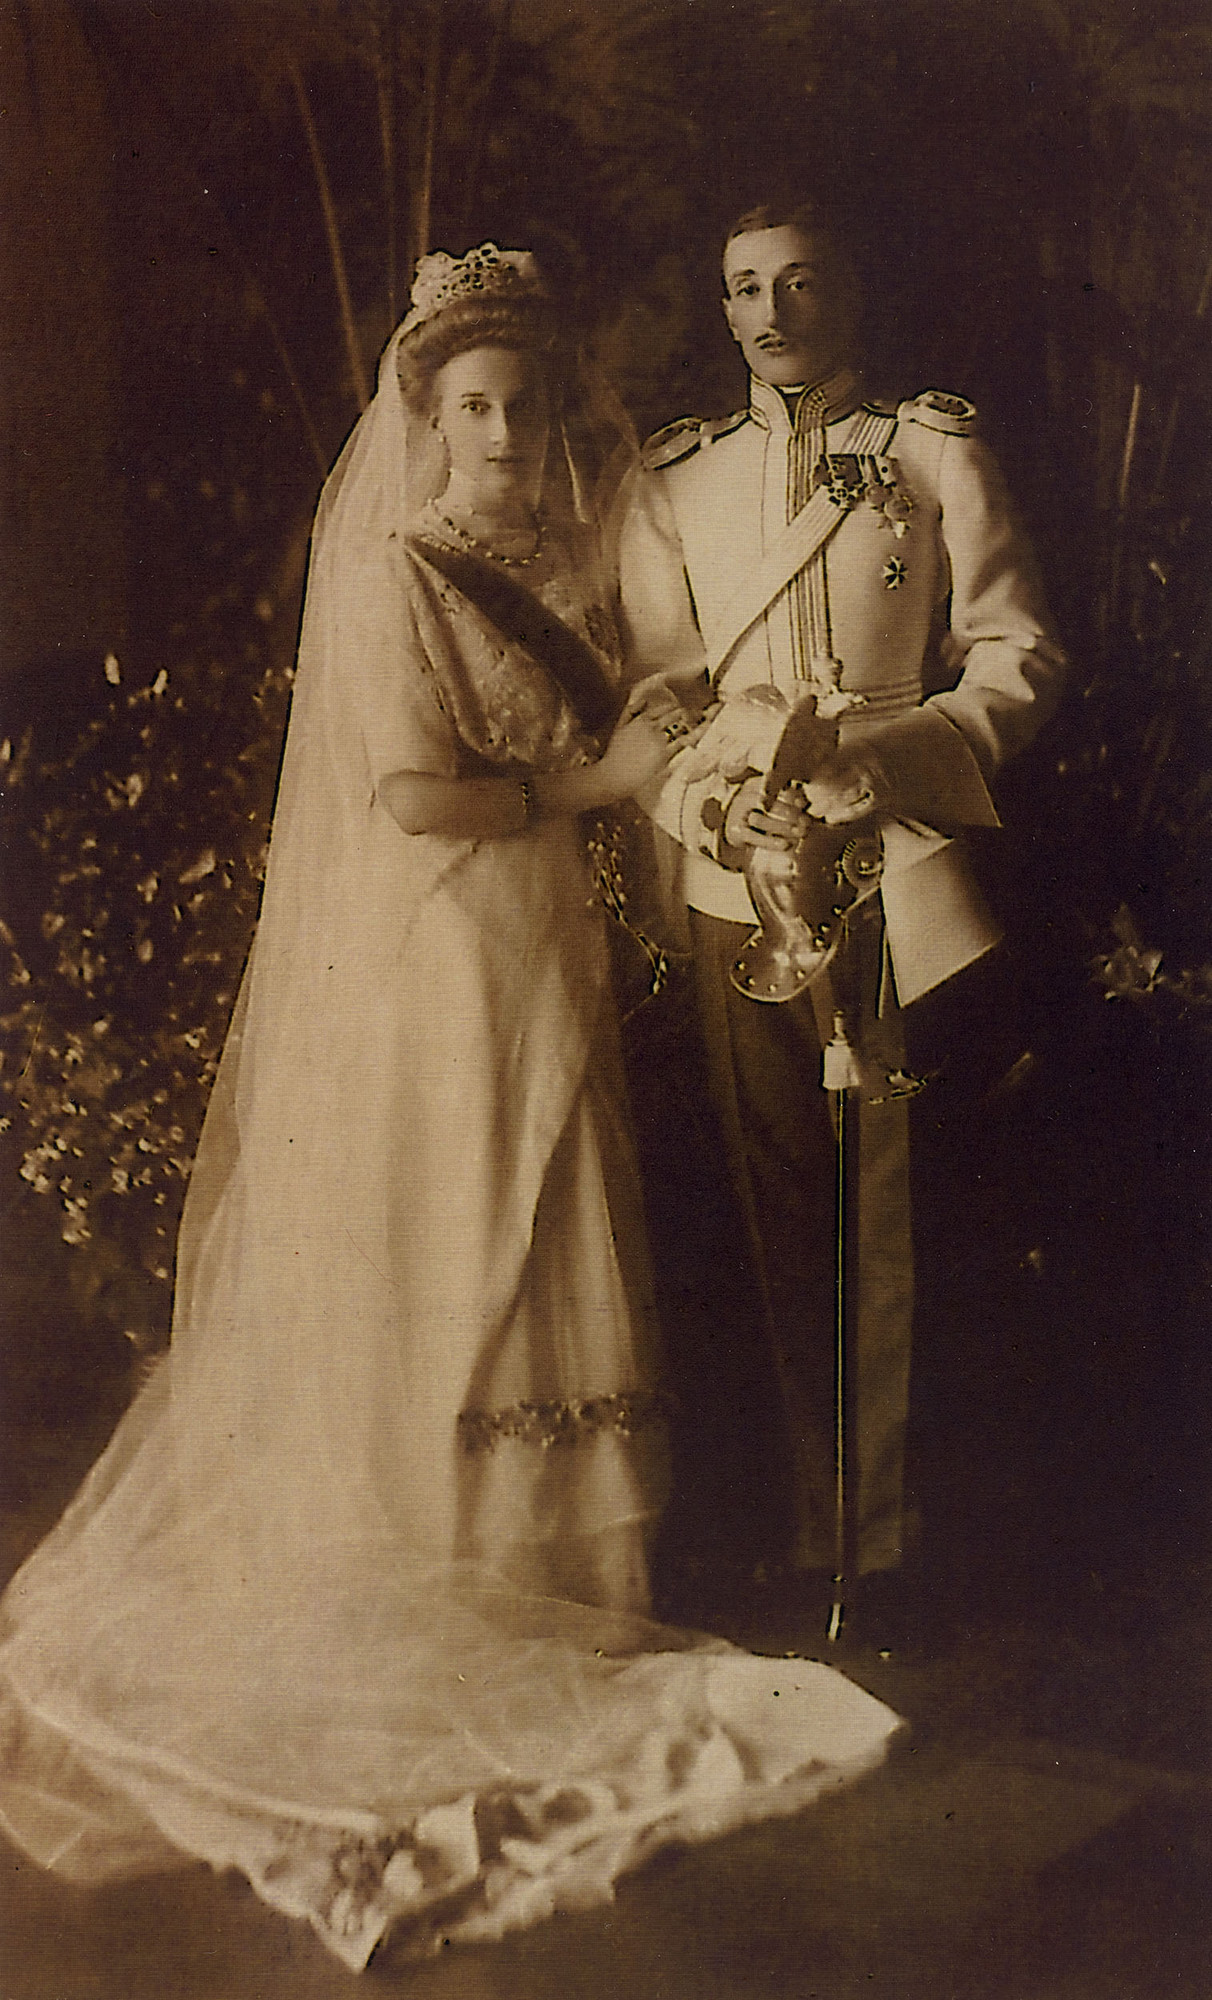 A wedding photo of the Georgian Prince Konstantine Bagration of Mukhrani and Princess Tatiana Constantinovna.